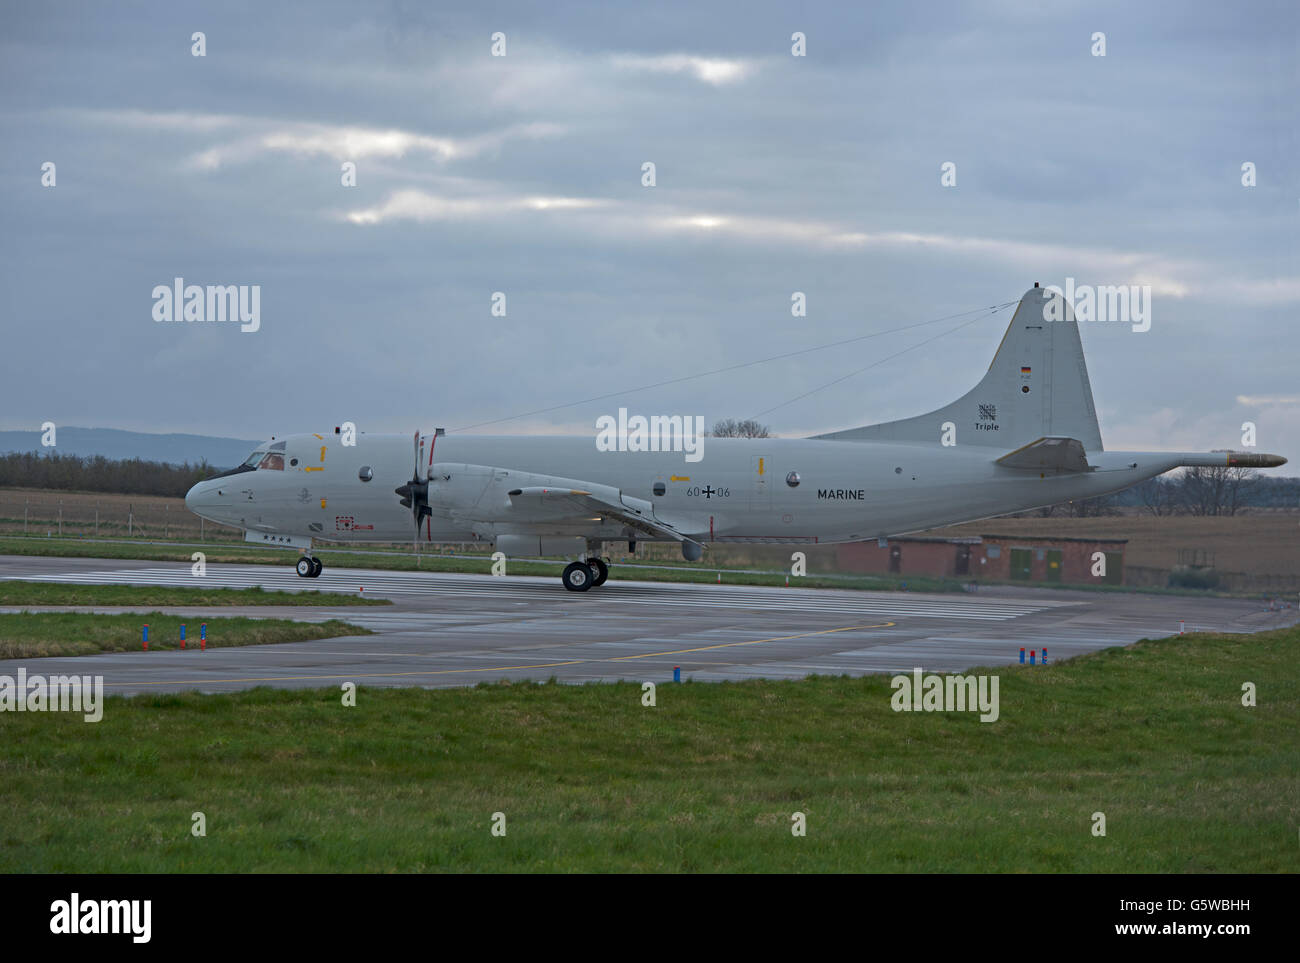 Lockheed P-3C Orion from MFG-3 Nordholz Serial Registration (60 + 06) SCO 10,541. Stock Photo